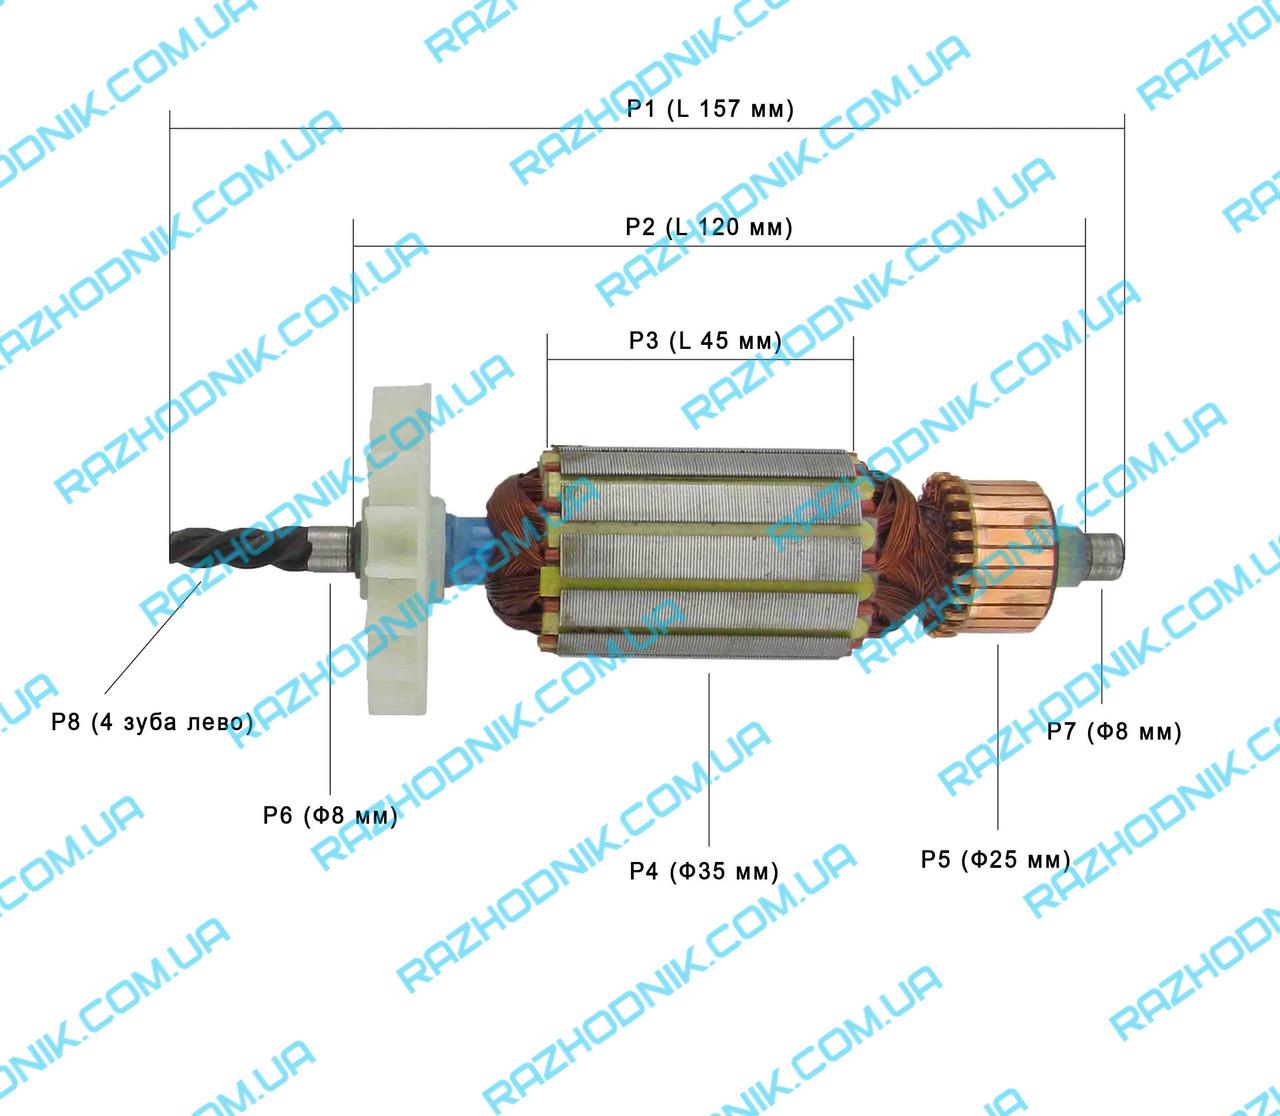 Якір на дриль Интерскол ДУ-13/780 ЕР